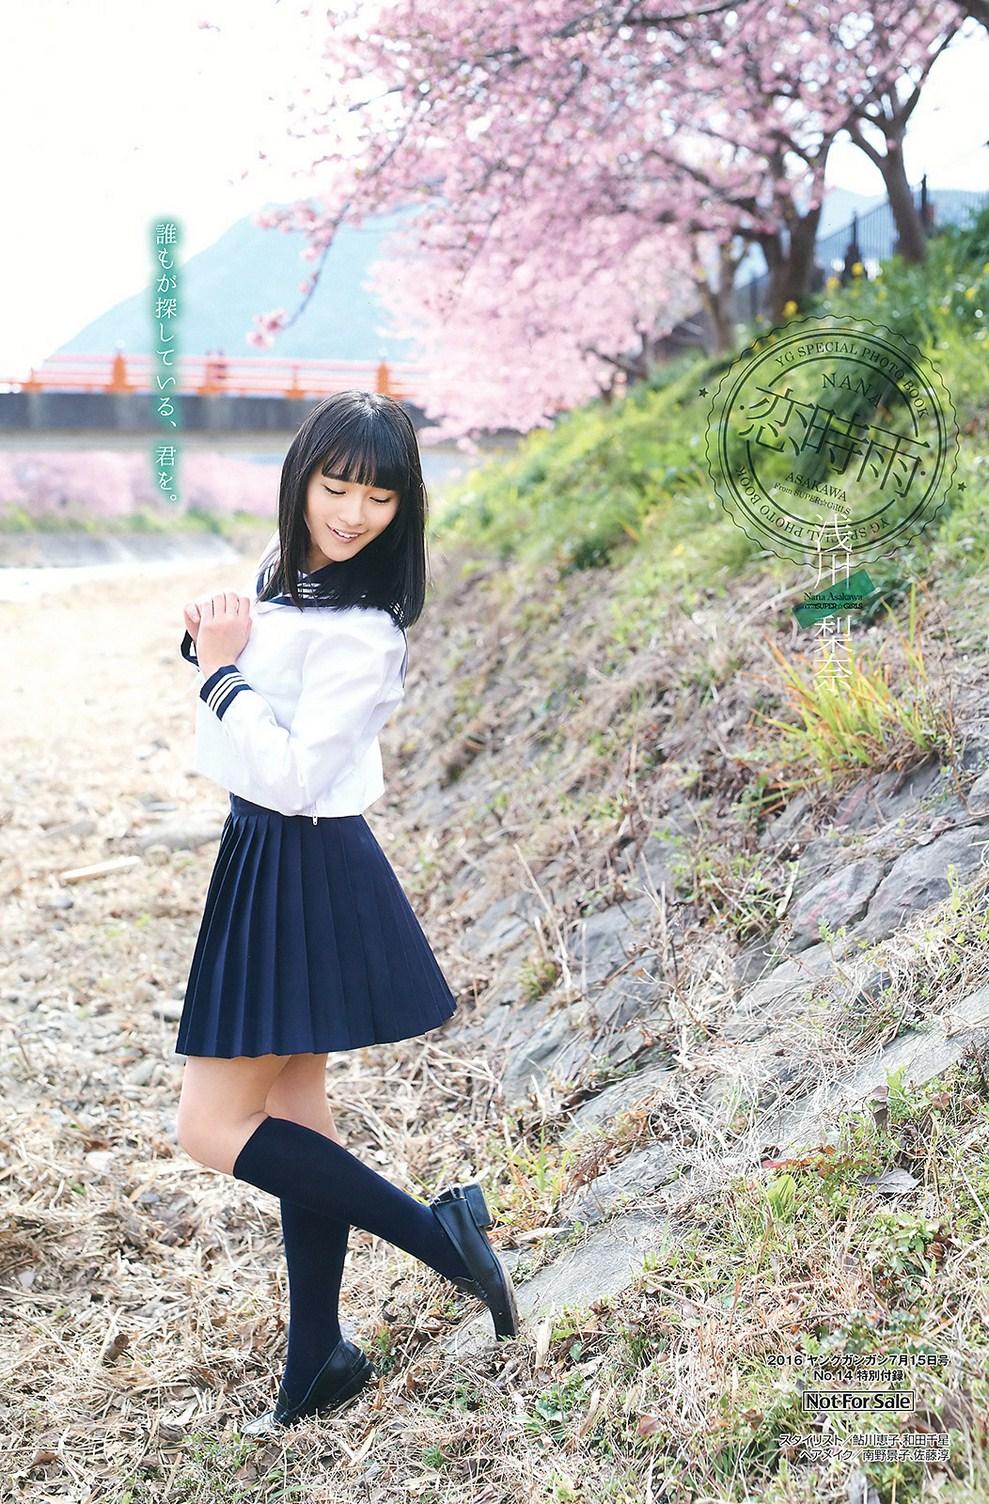 Asakawa Nana 浅川梨奈 SUPER☆GiRLS, Young Gangan Special PhotoBook